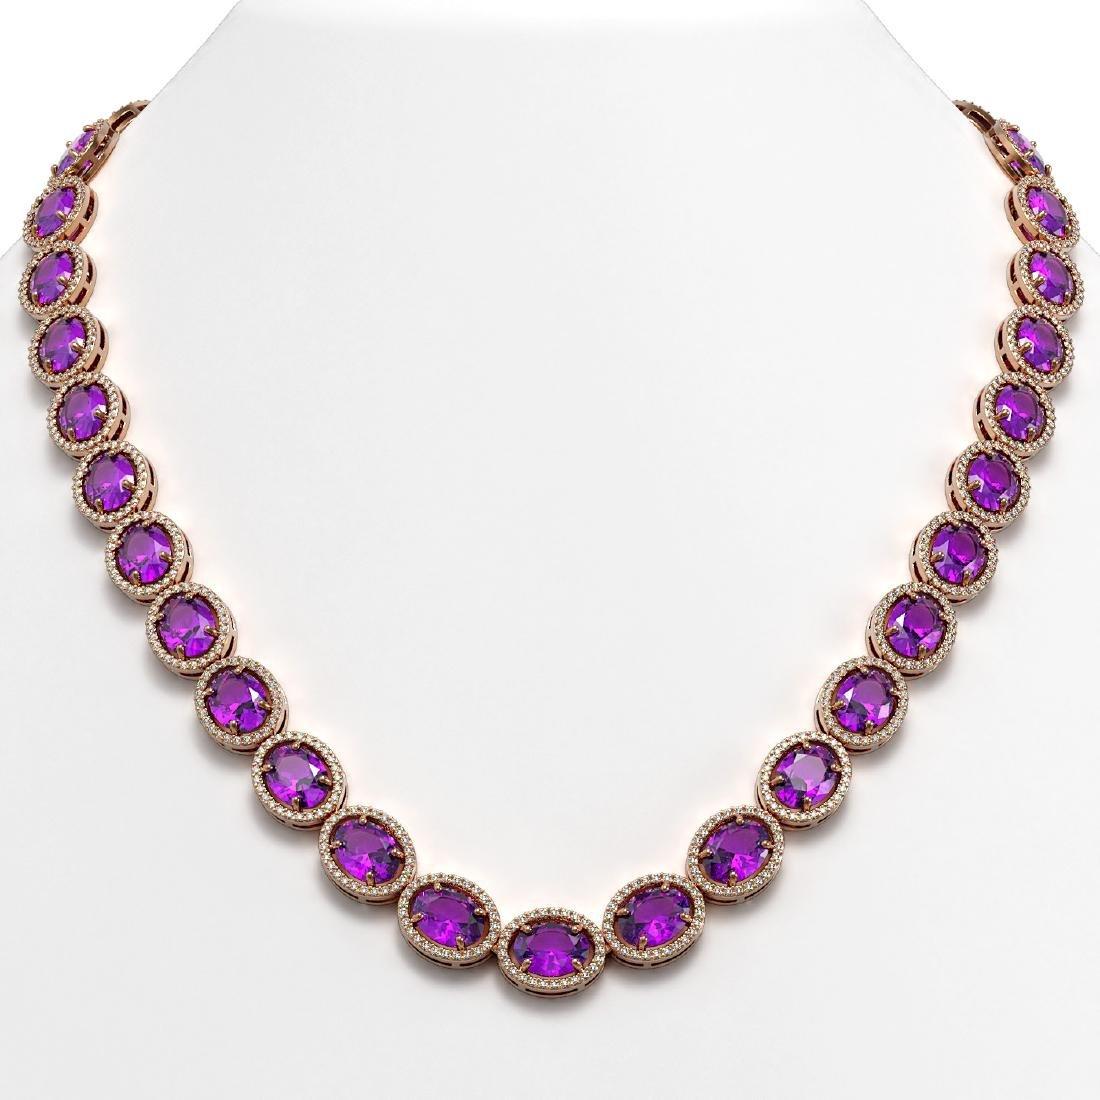 57.07 CTW Amethyst & Diamond Halo Necklace 10K Rose